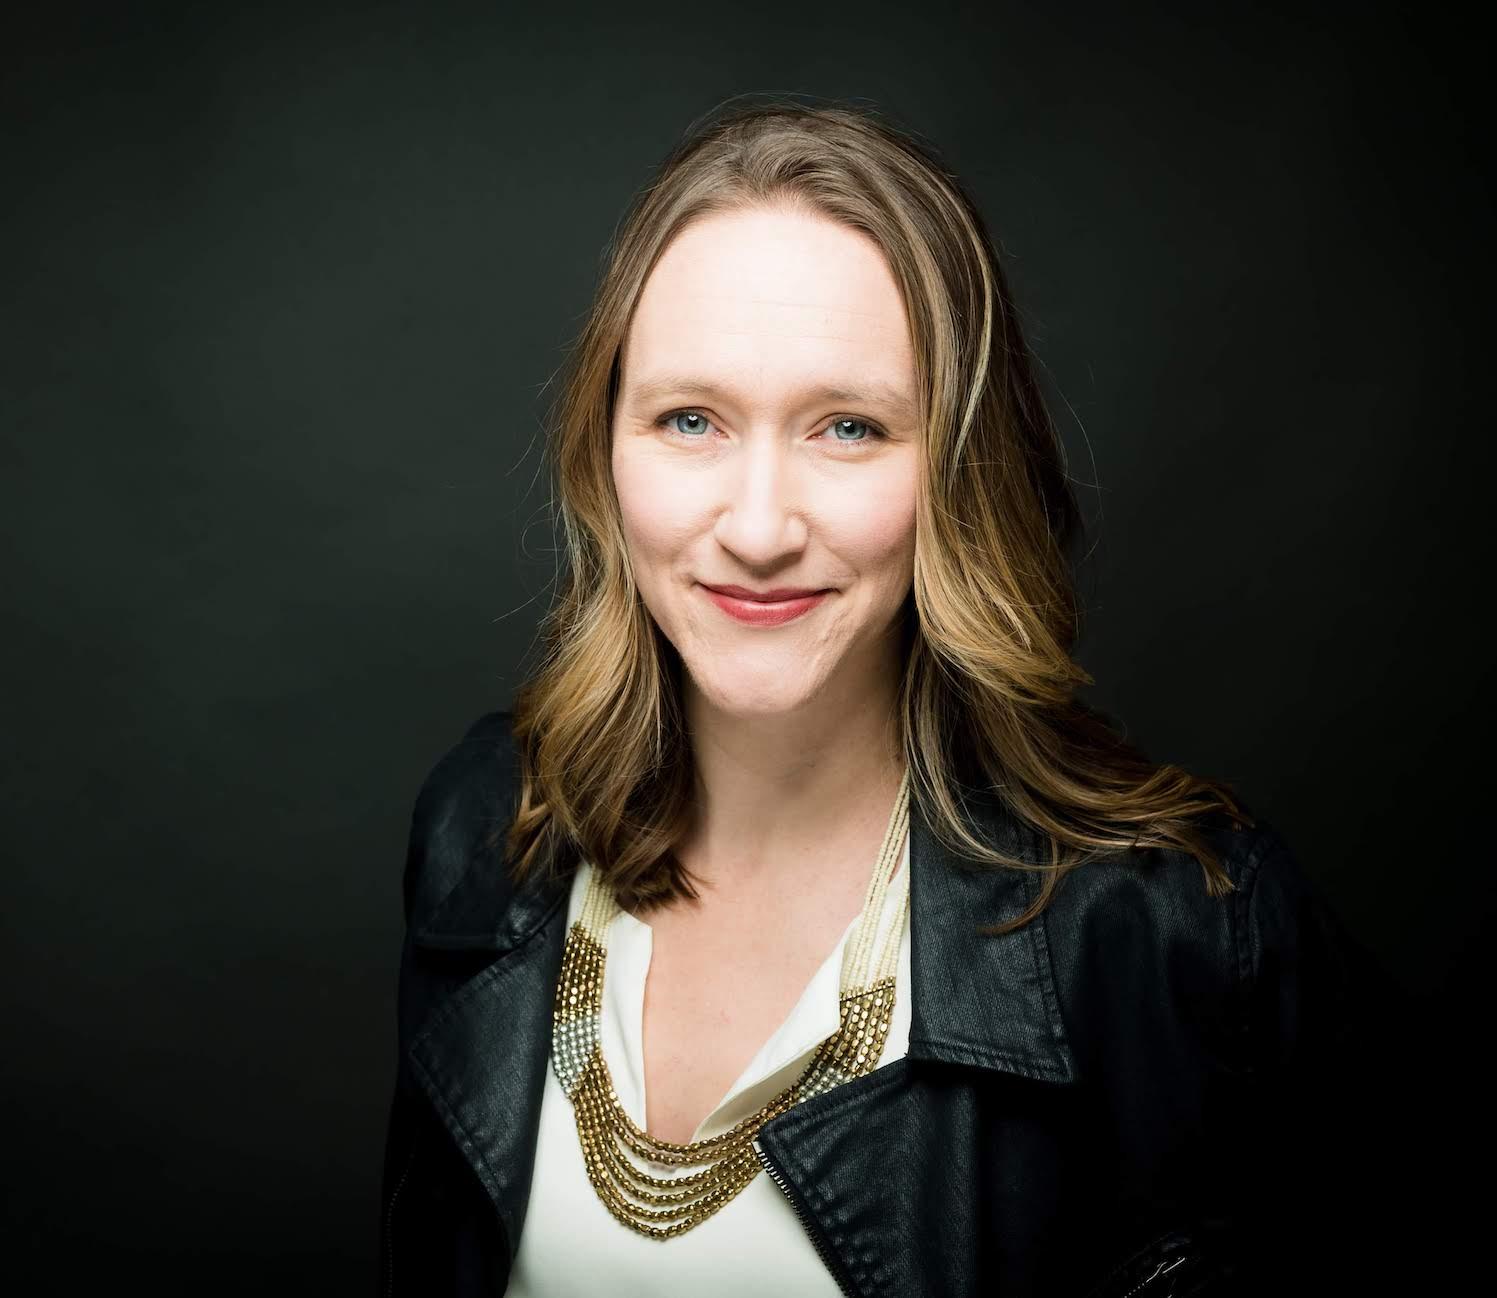 Melissa Moody